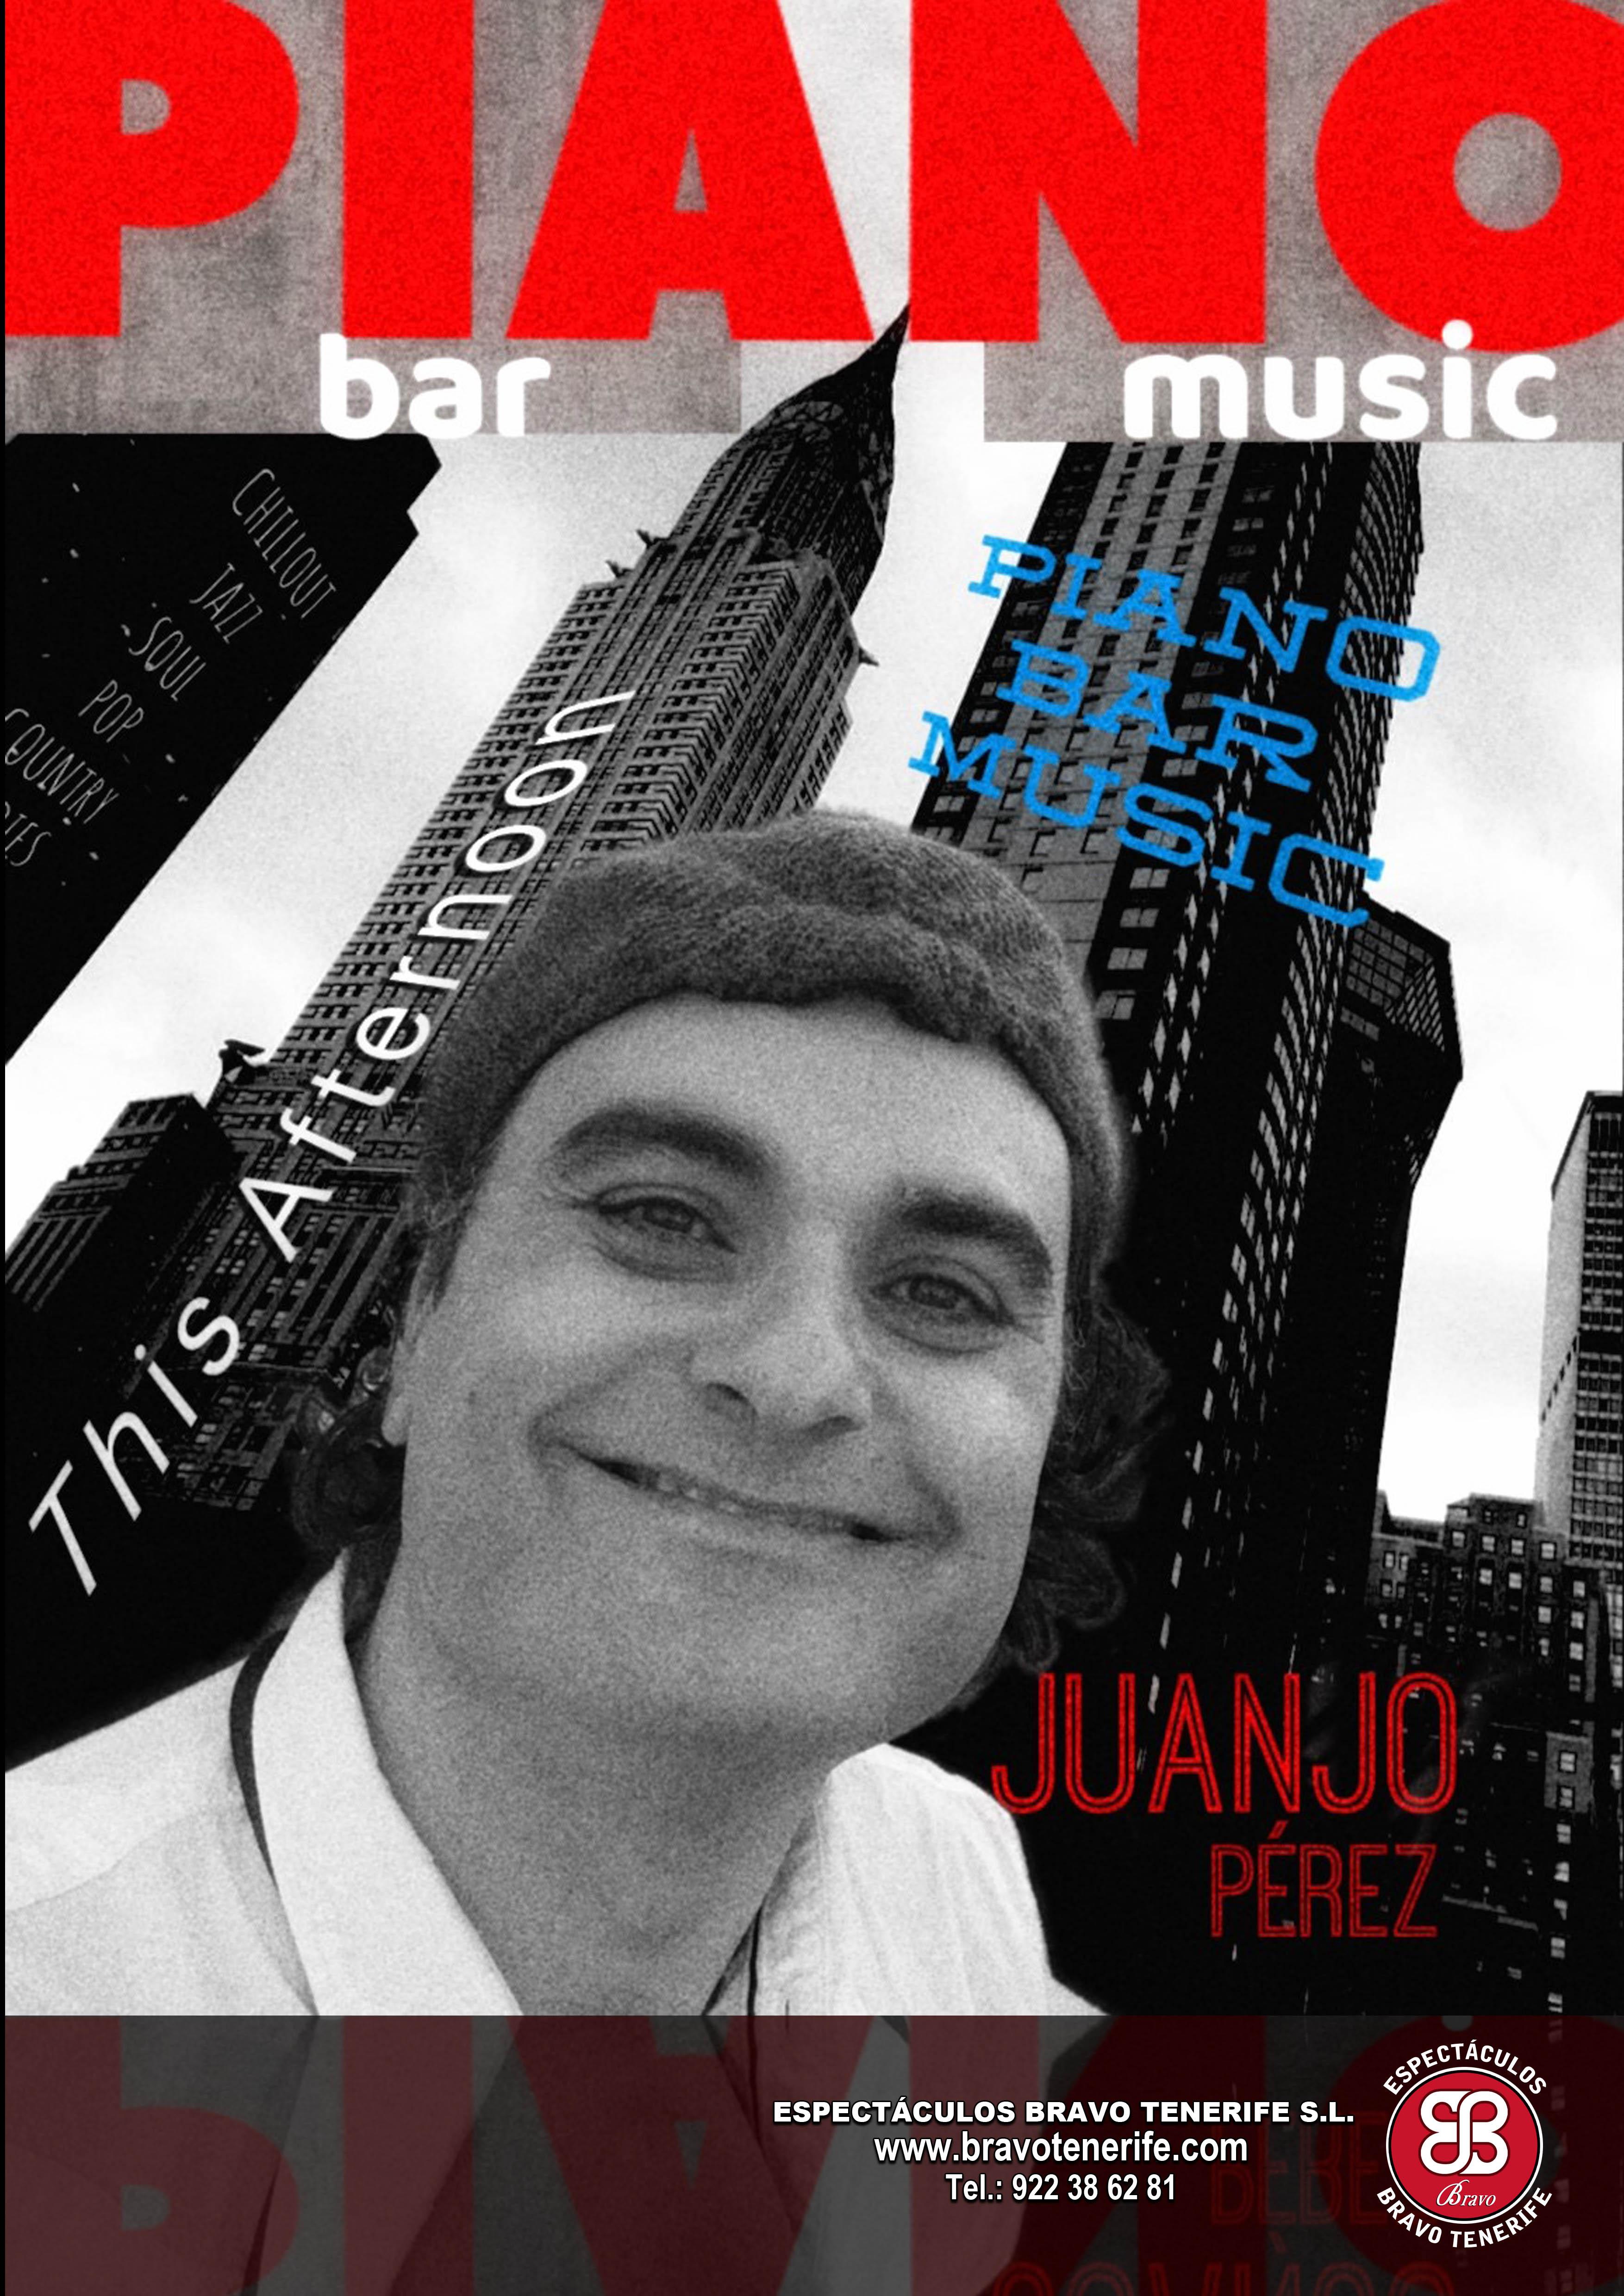 juanjo-perez-piano-bravo